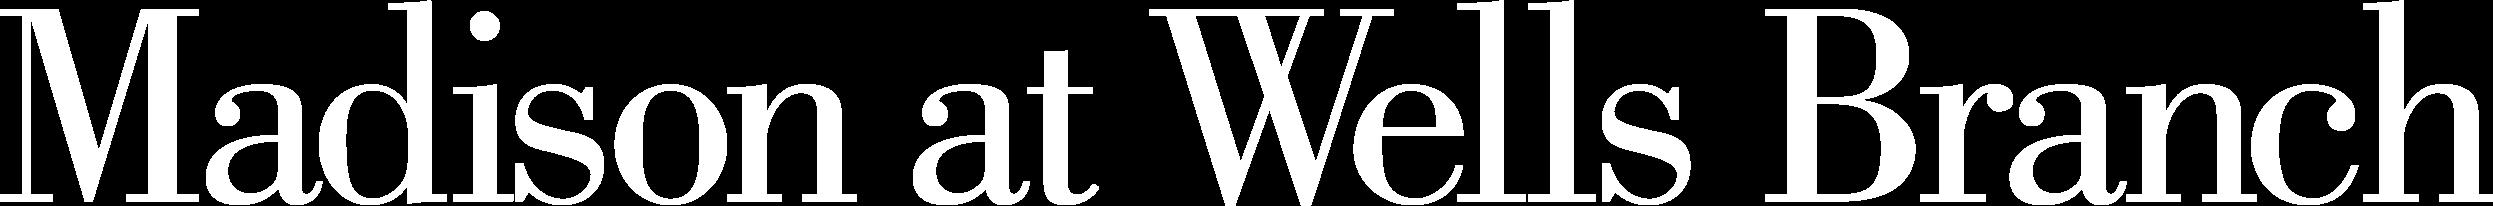 Property Logo at Madison at Wells Branch, Texas, 78727